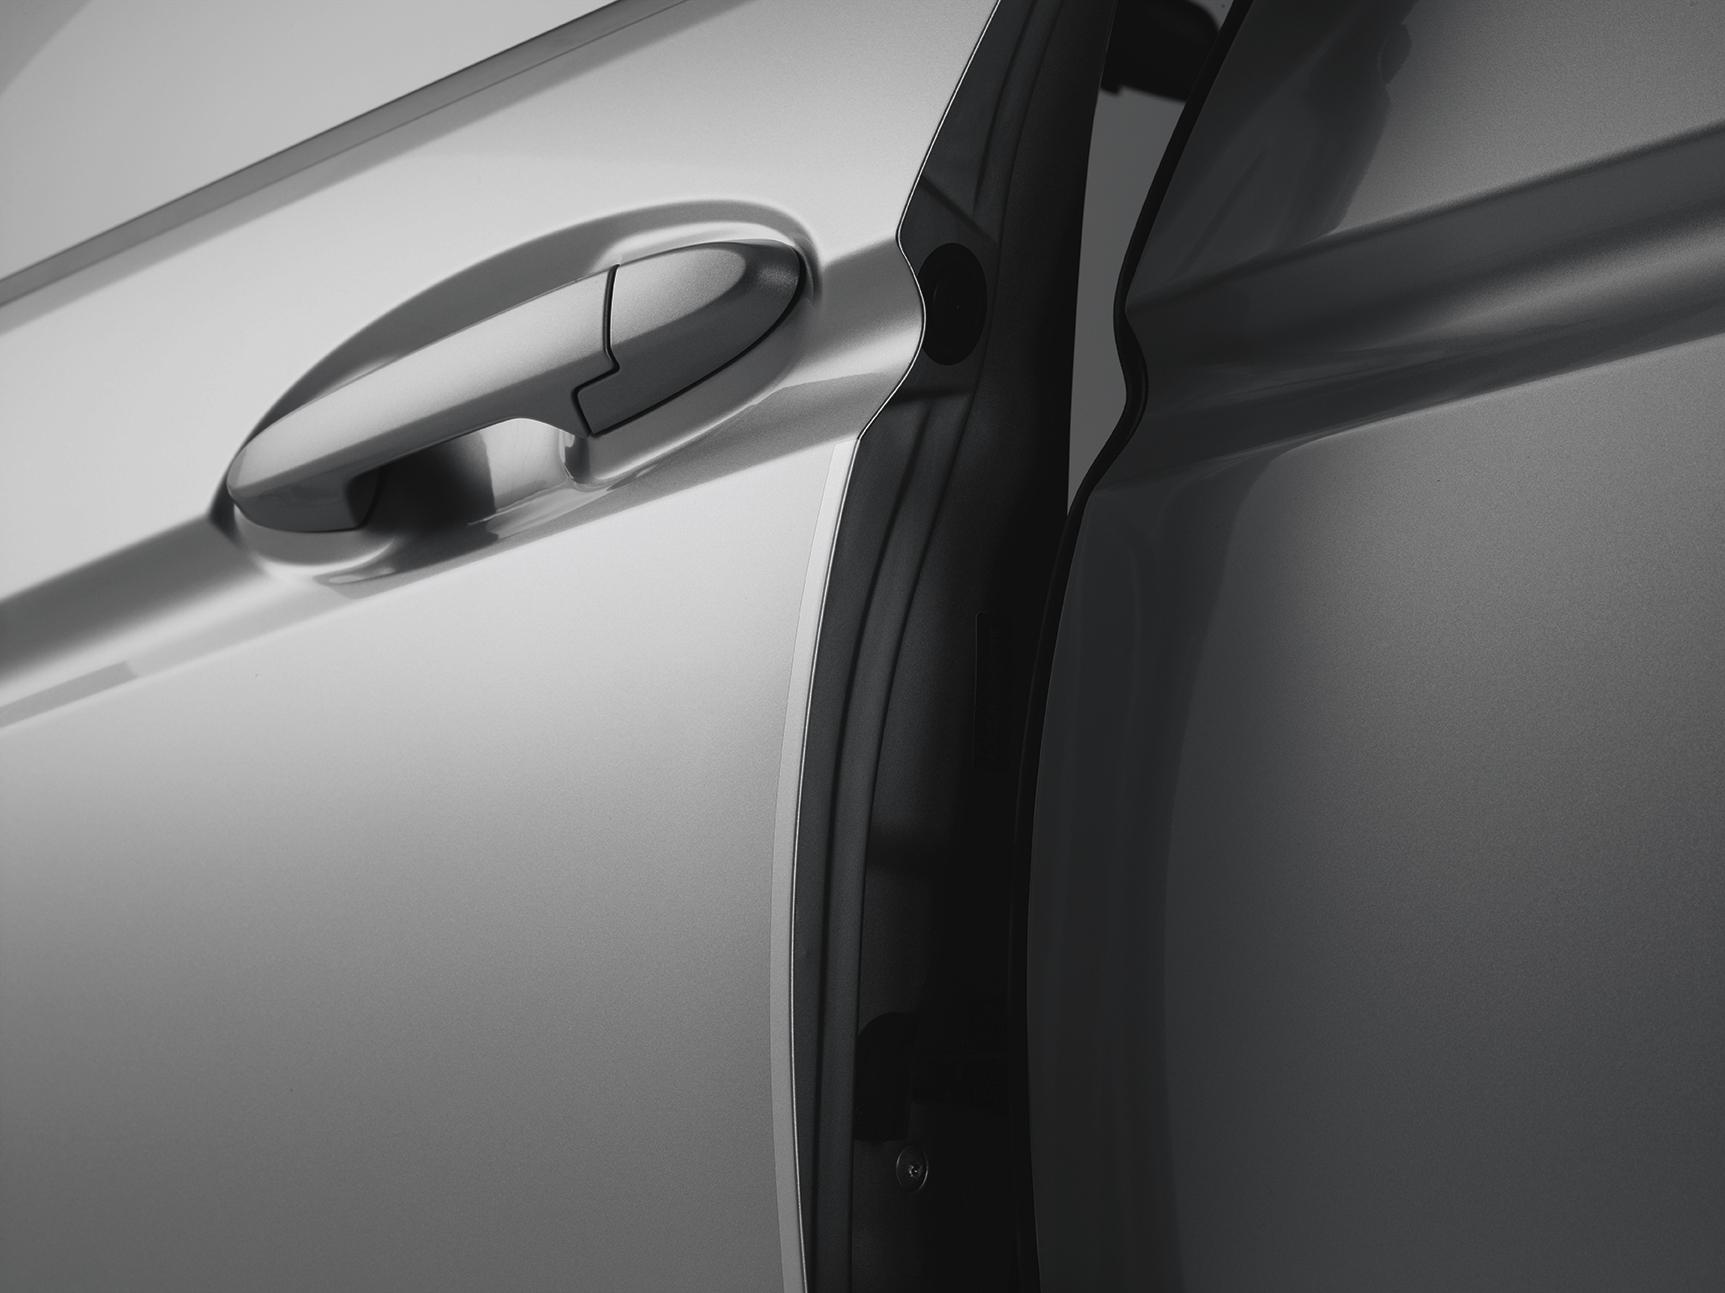 2017 Honda Pilot Trailer Wiring Harness From M 2004 Manuals Cross Bar Installation Instructions